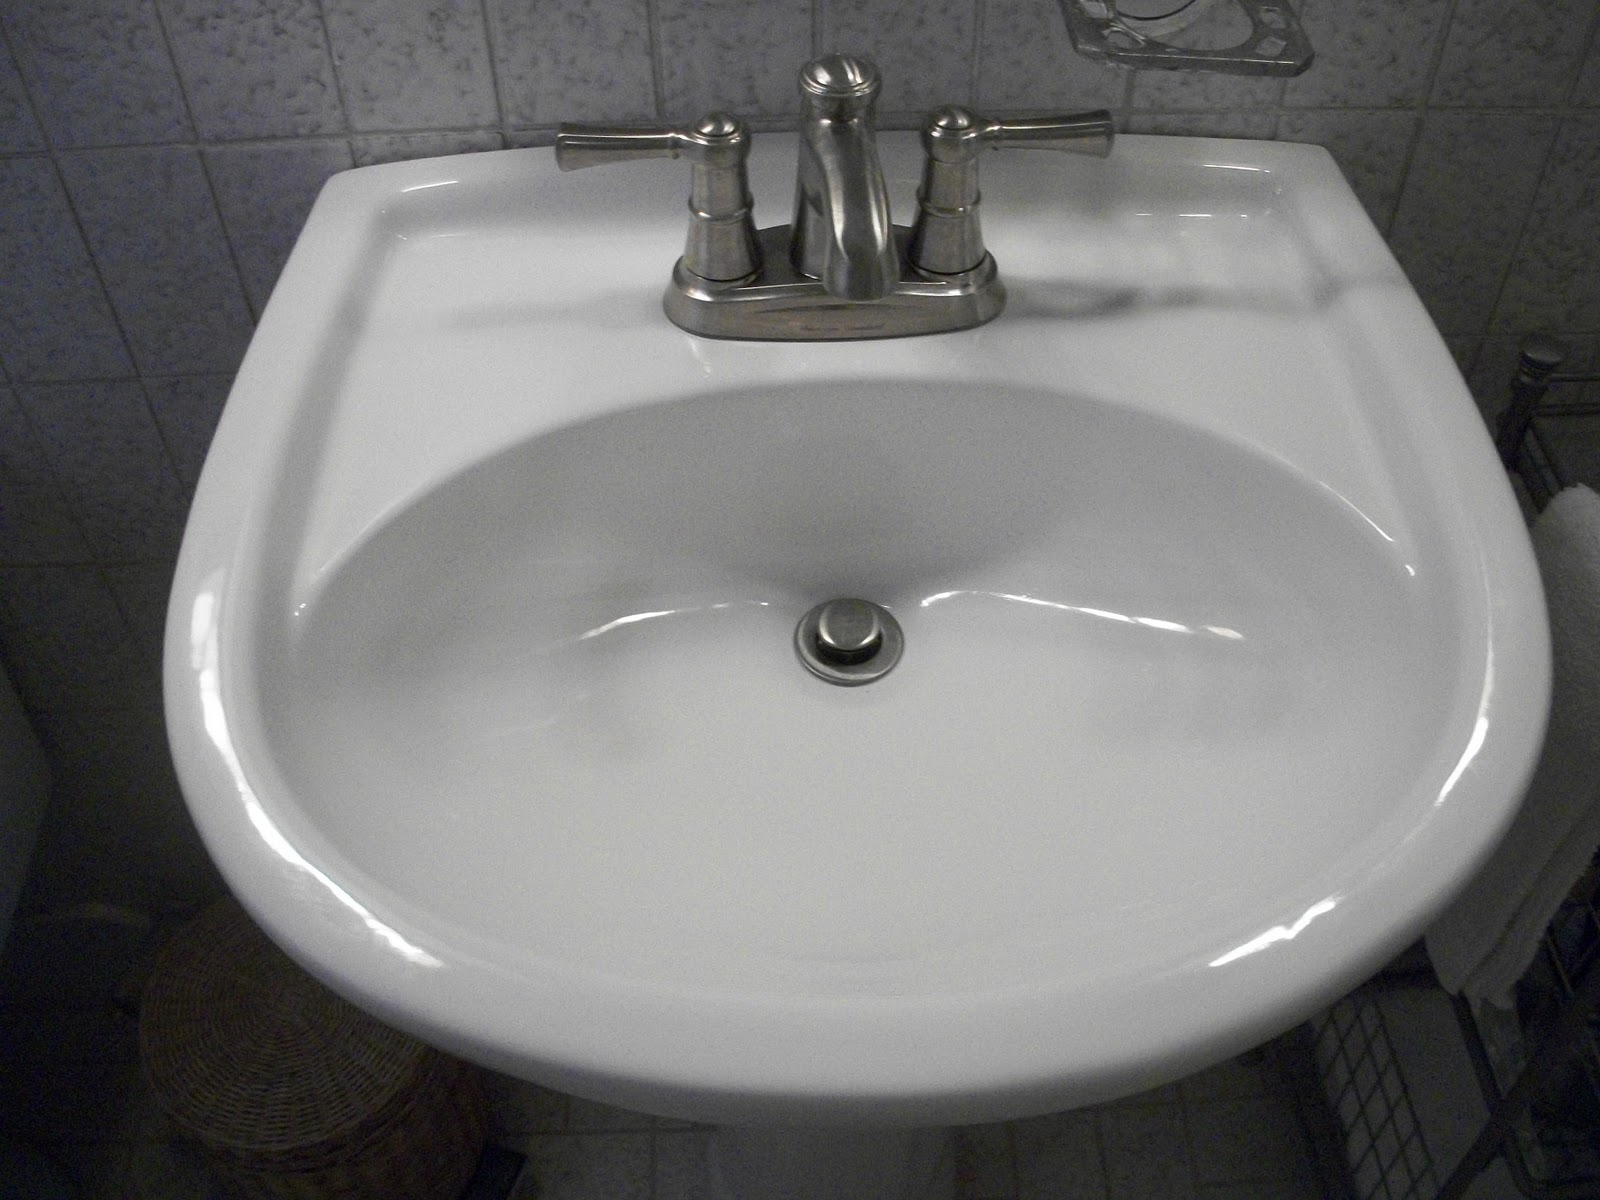 Nourish: Sink-ronicity